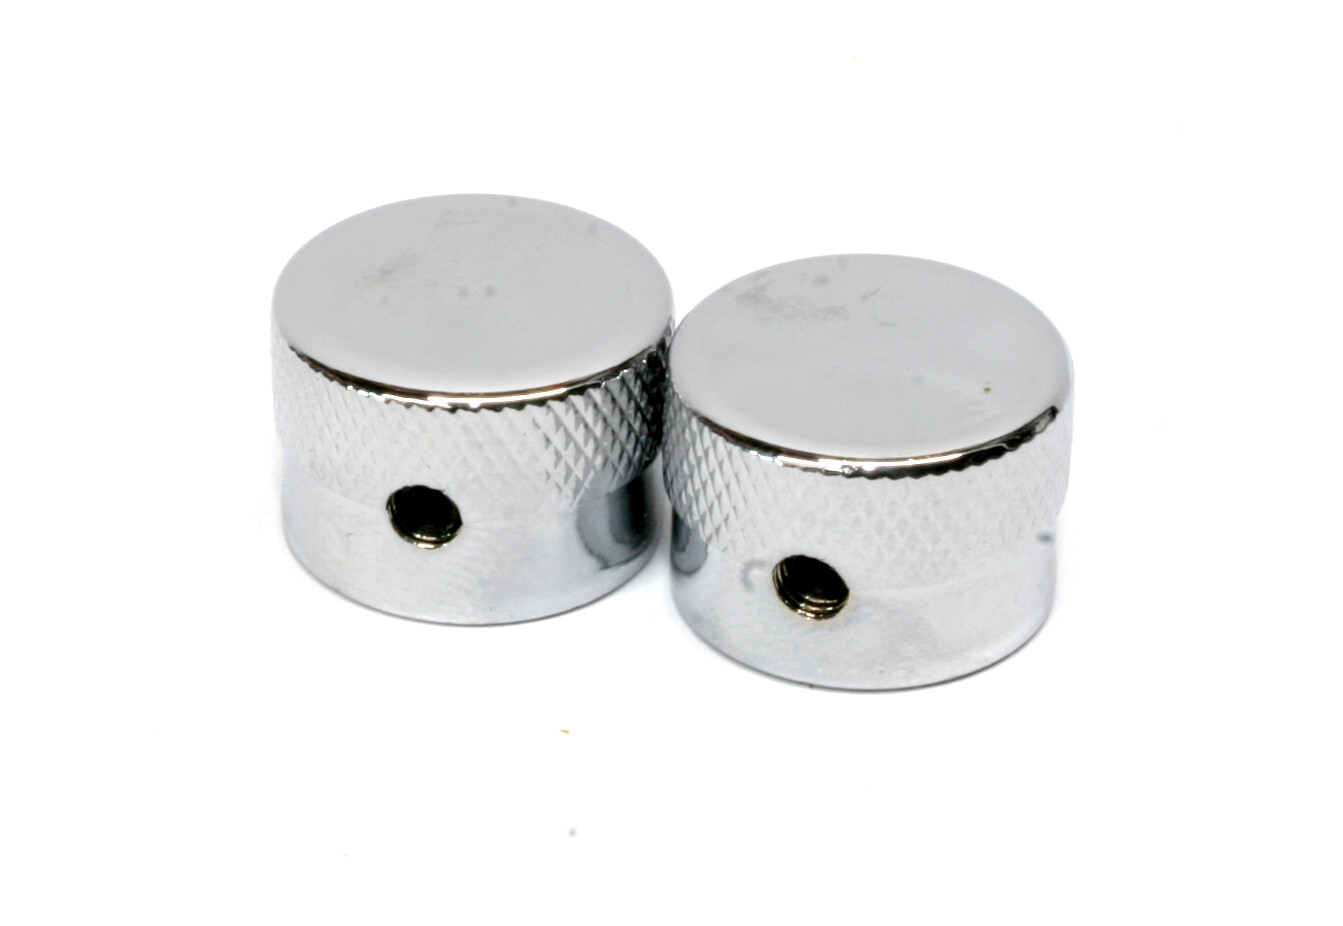 Gretsch Style Chrome knobs (2), with set screw, fits USA split shaft pots